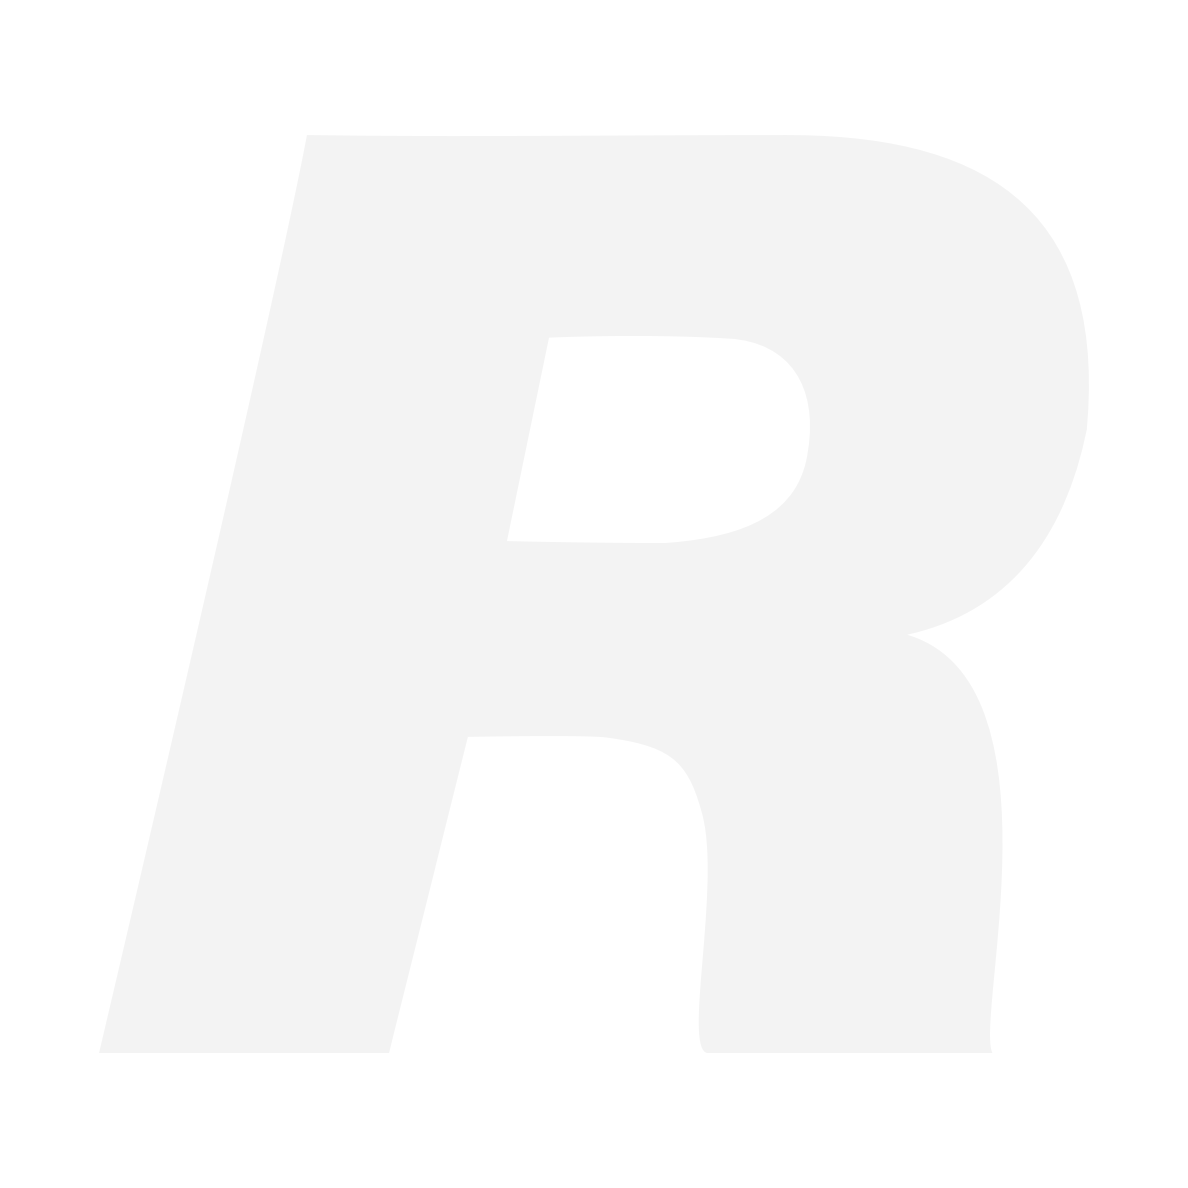 Elinchrom välähdysputki (BRX/BXRi/Quadra A)